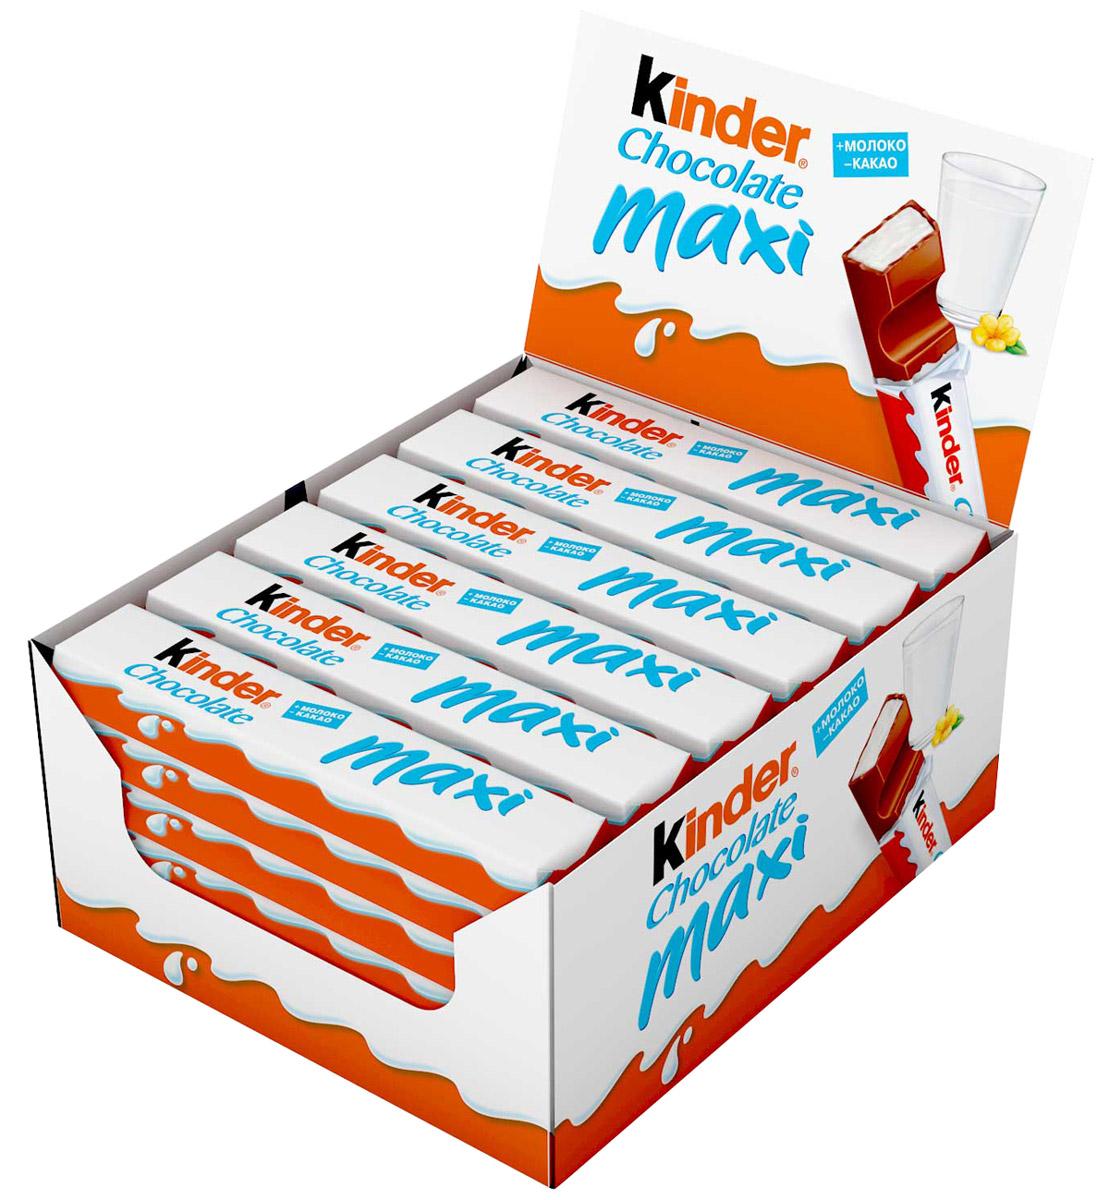 Kinder Chocolate Maxi шоколадный батончик молочный, 36 шт по 21 г kinder choco bons конфеты из молочного шоколада с молочно ореховой начинкой 46 г